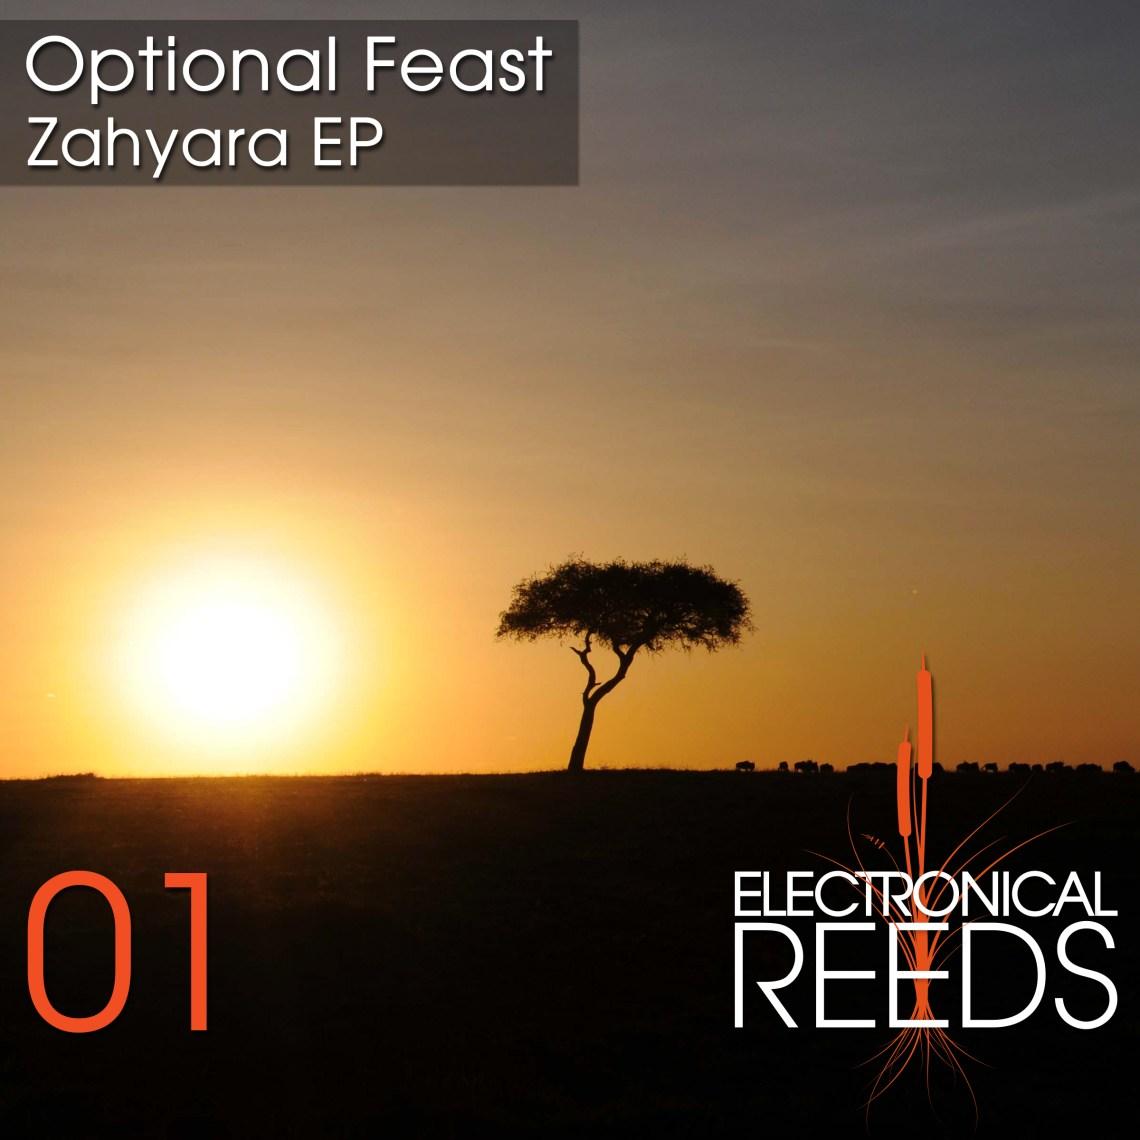 ER001 - Optional Feast - Zahyara EP (incl. Mirko Loko & Ecco Remix) - Electronical Reeds